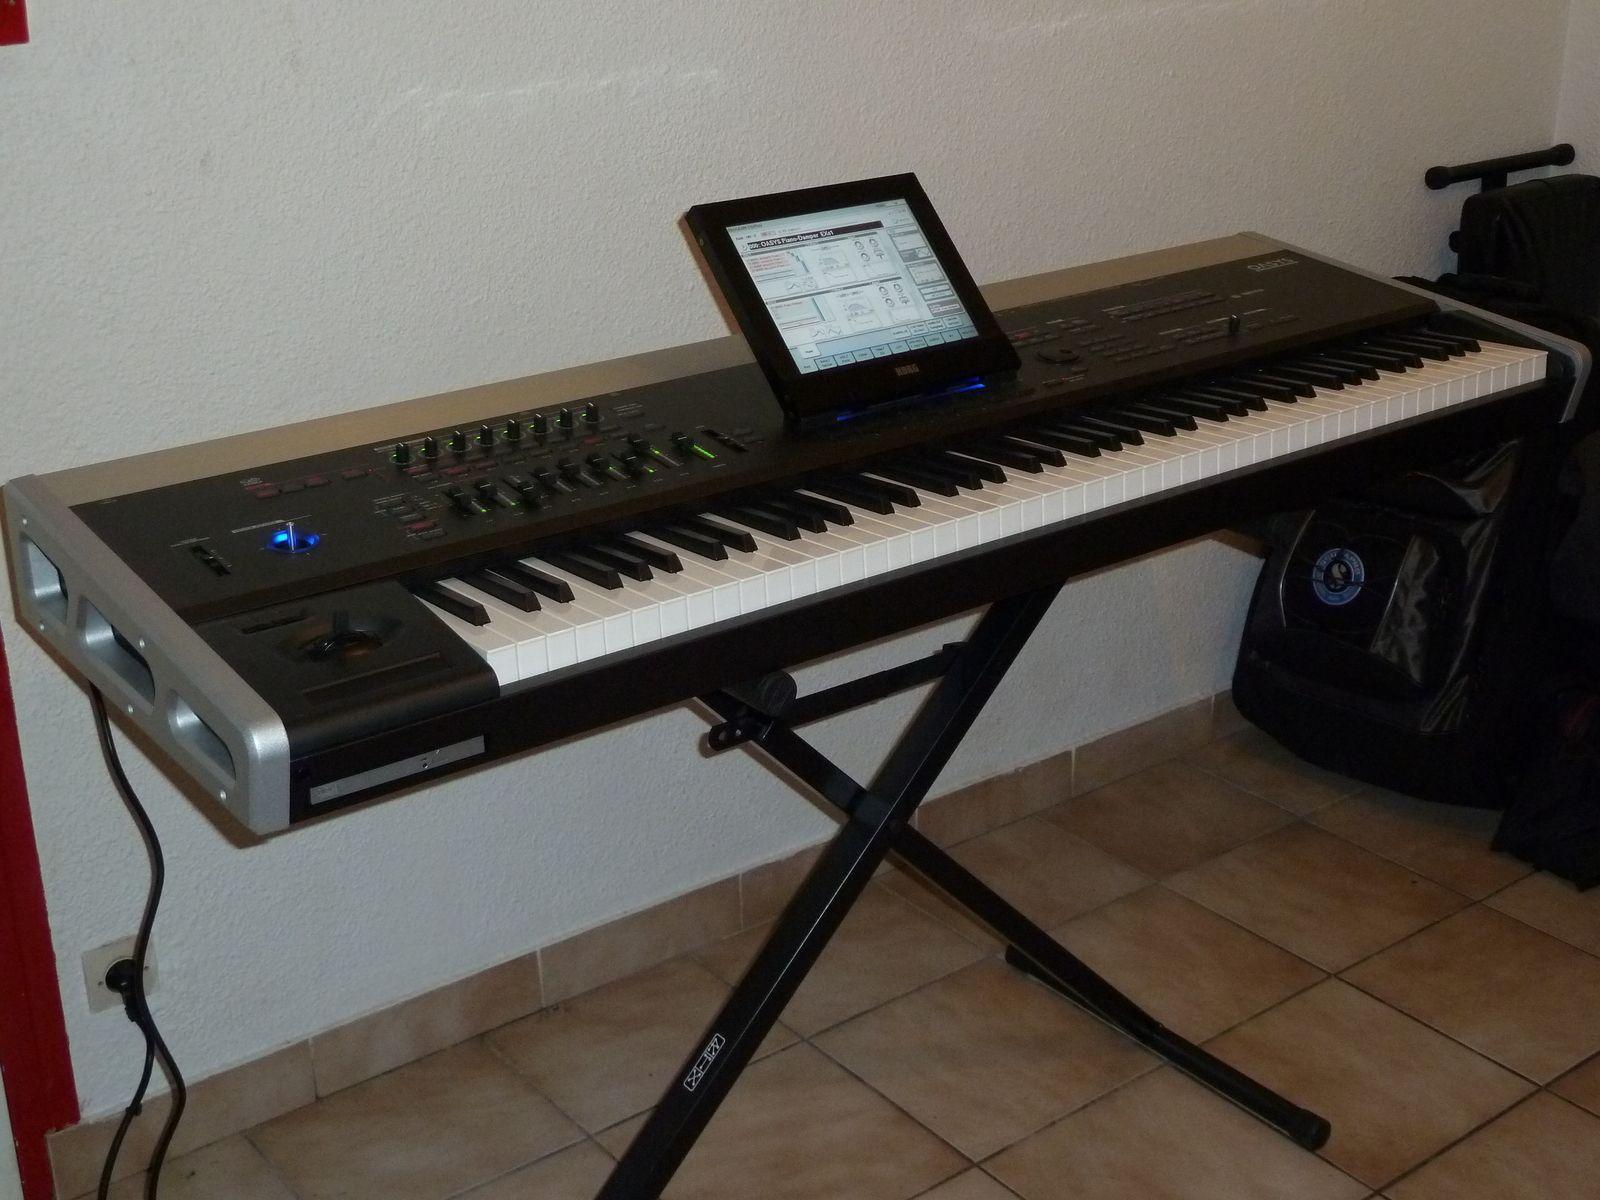 Korg Oasys: Musical Instruments & Gear | eBay